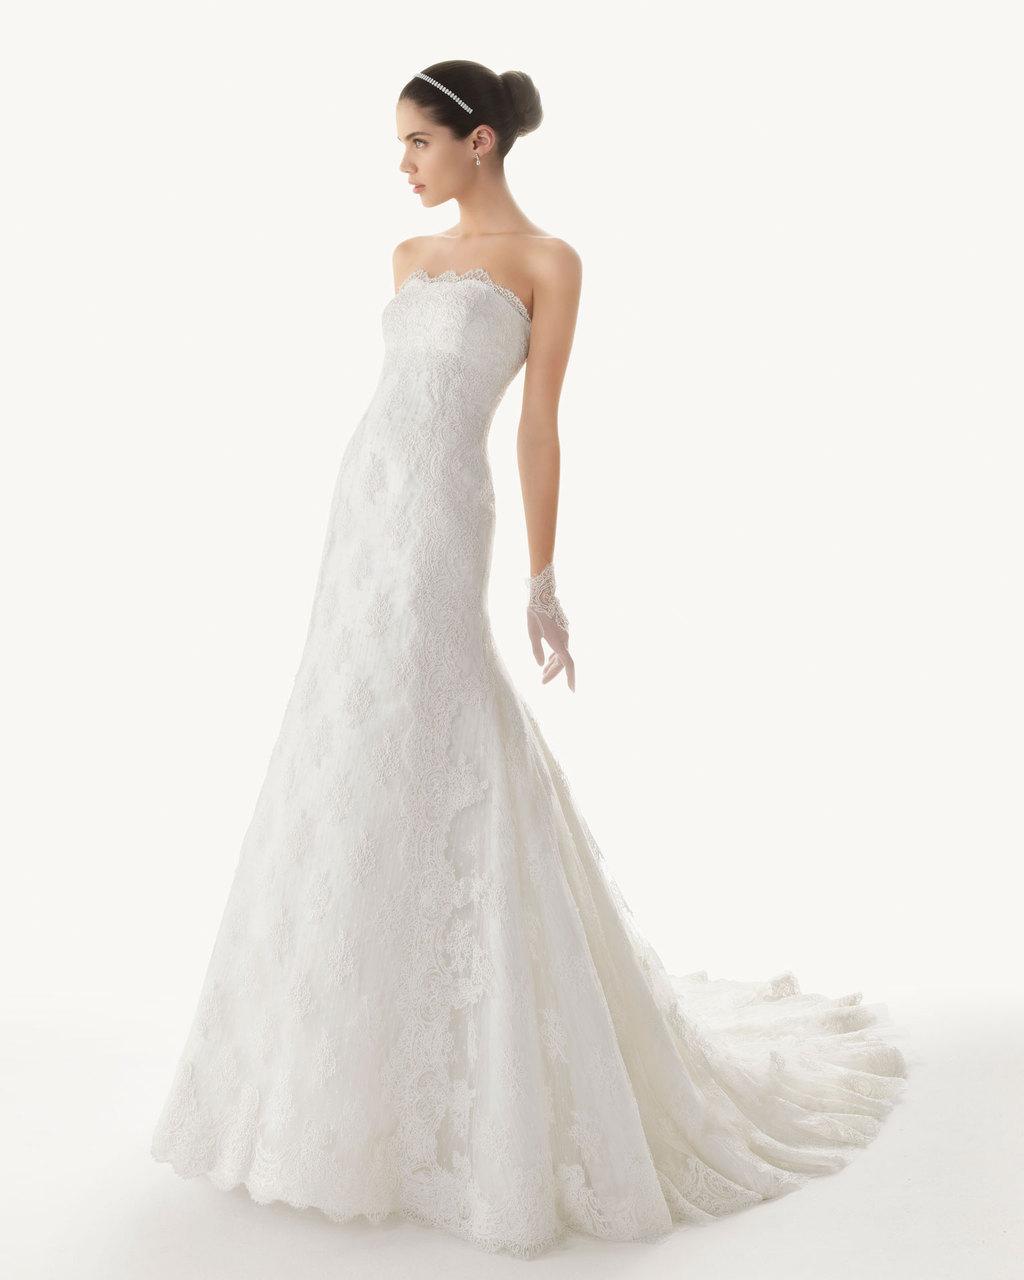 Transforming-wedding-dresses-2013-bridal-gown-by-rosa-clara-14.full